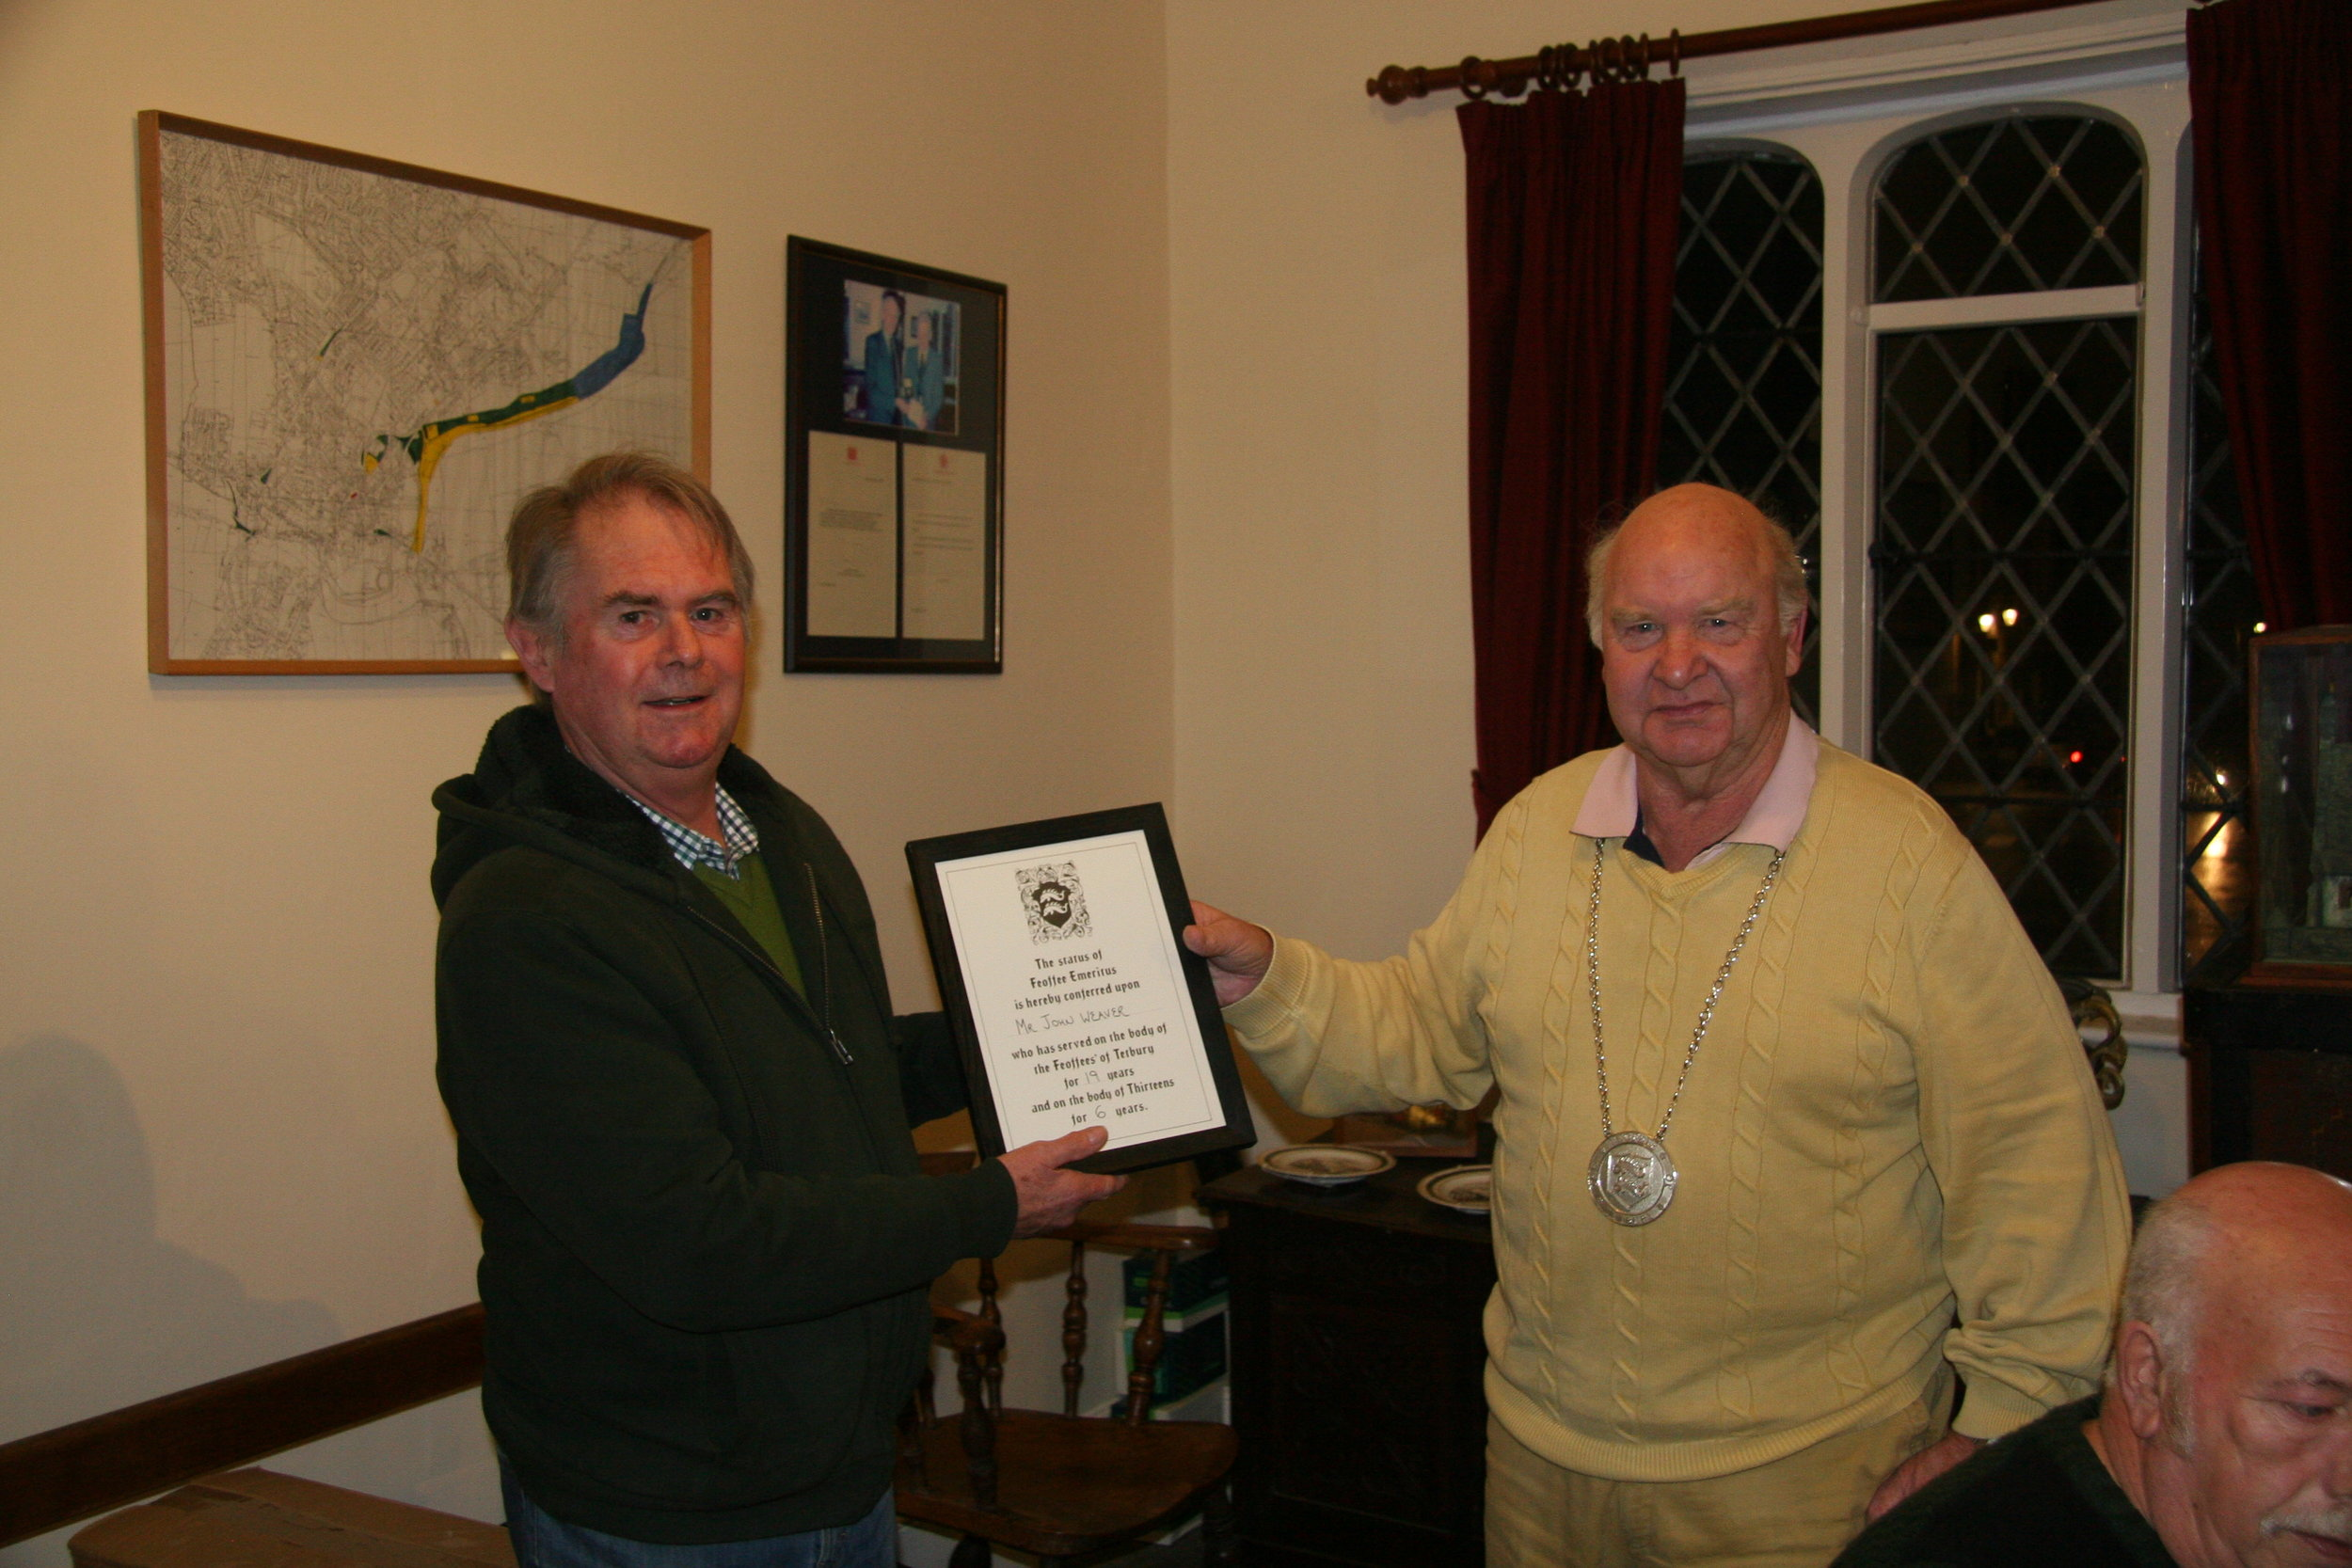 John Weaver receiving certificate